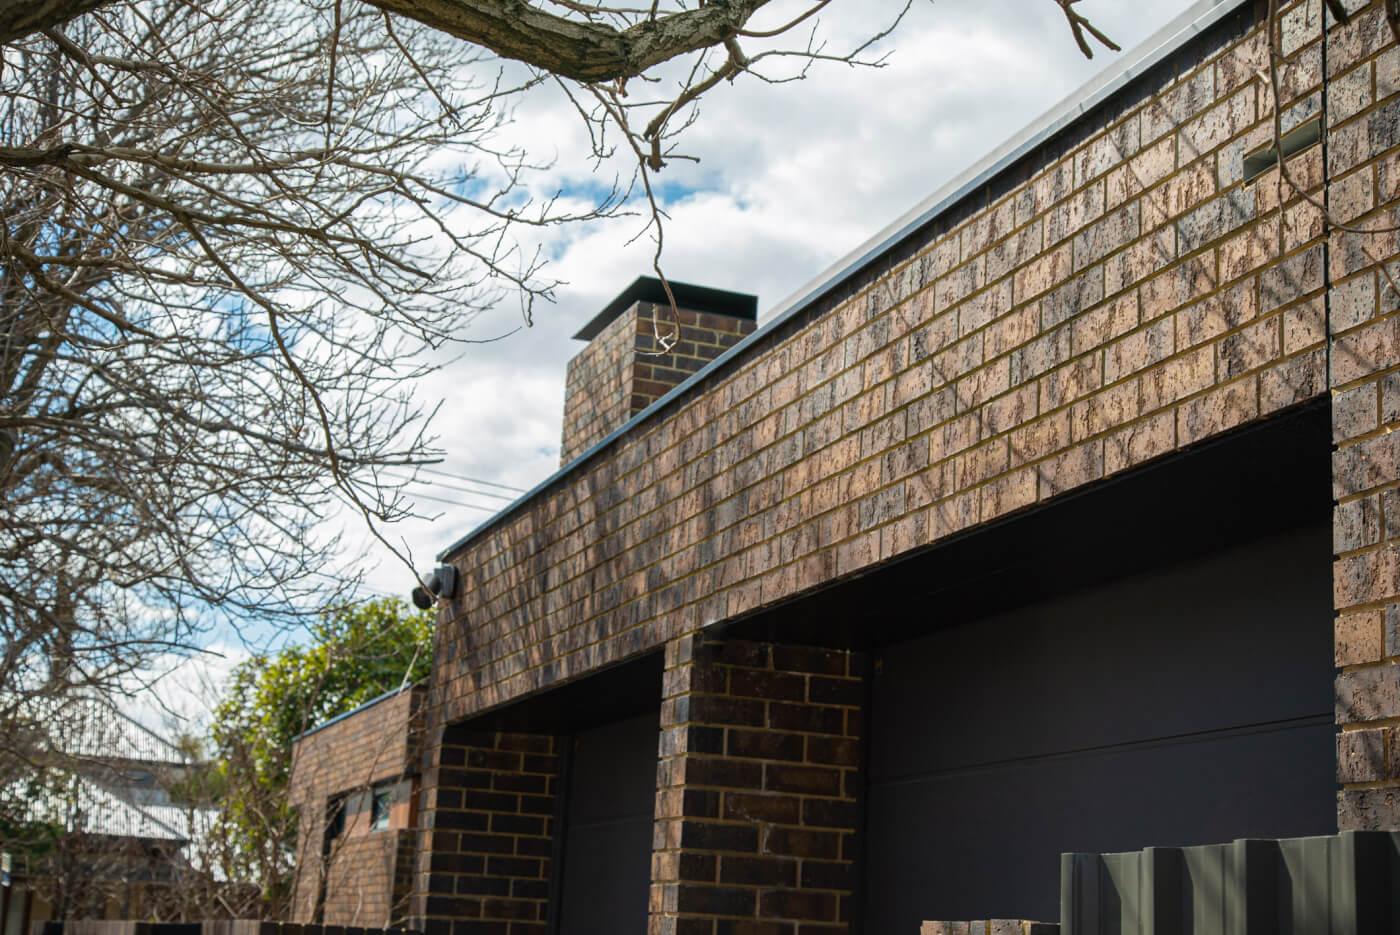 Coachhouse Brick 76mm Hyde Park Littlehampon Bricks And Pavers Reduced